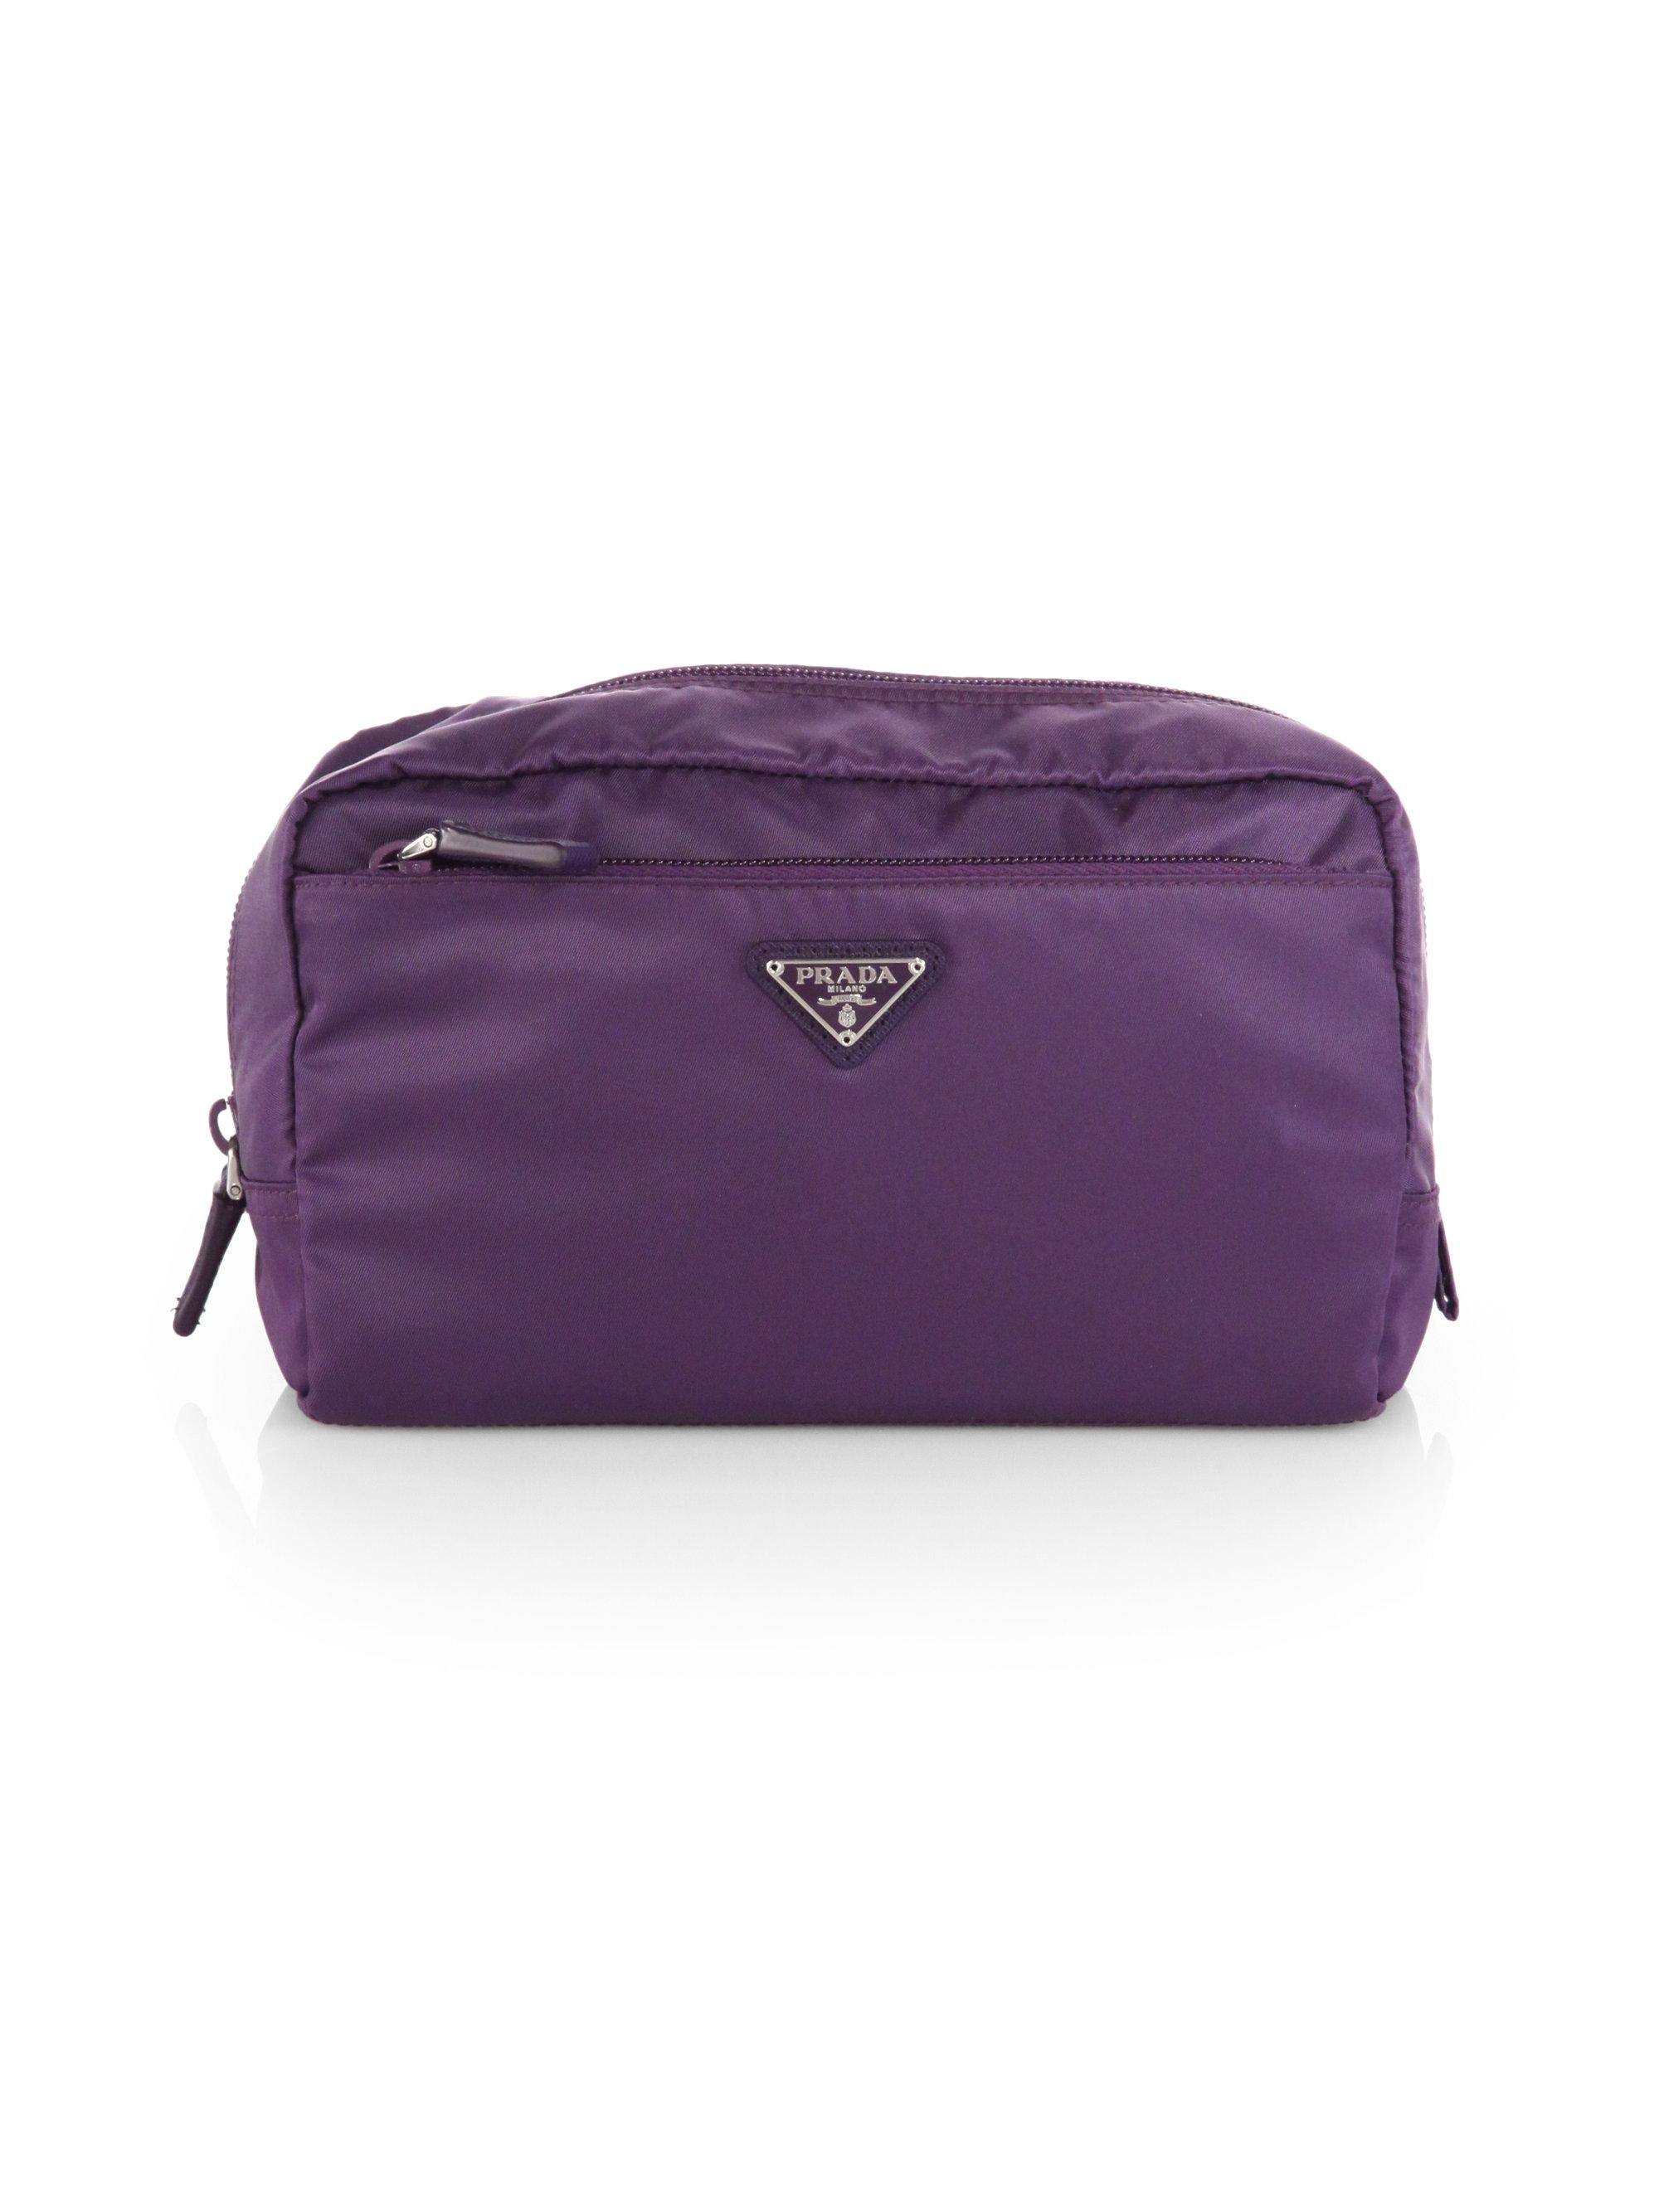 b1a61b83c9f7fd Prada Vela Extra Large Nylon Cosmetics Case in Purple - Lyst